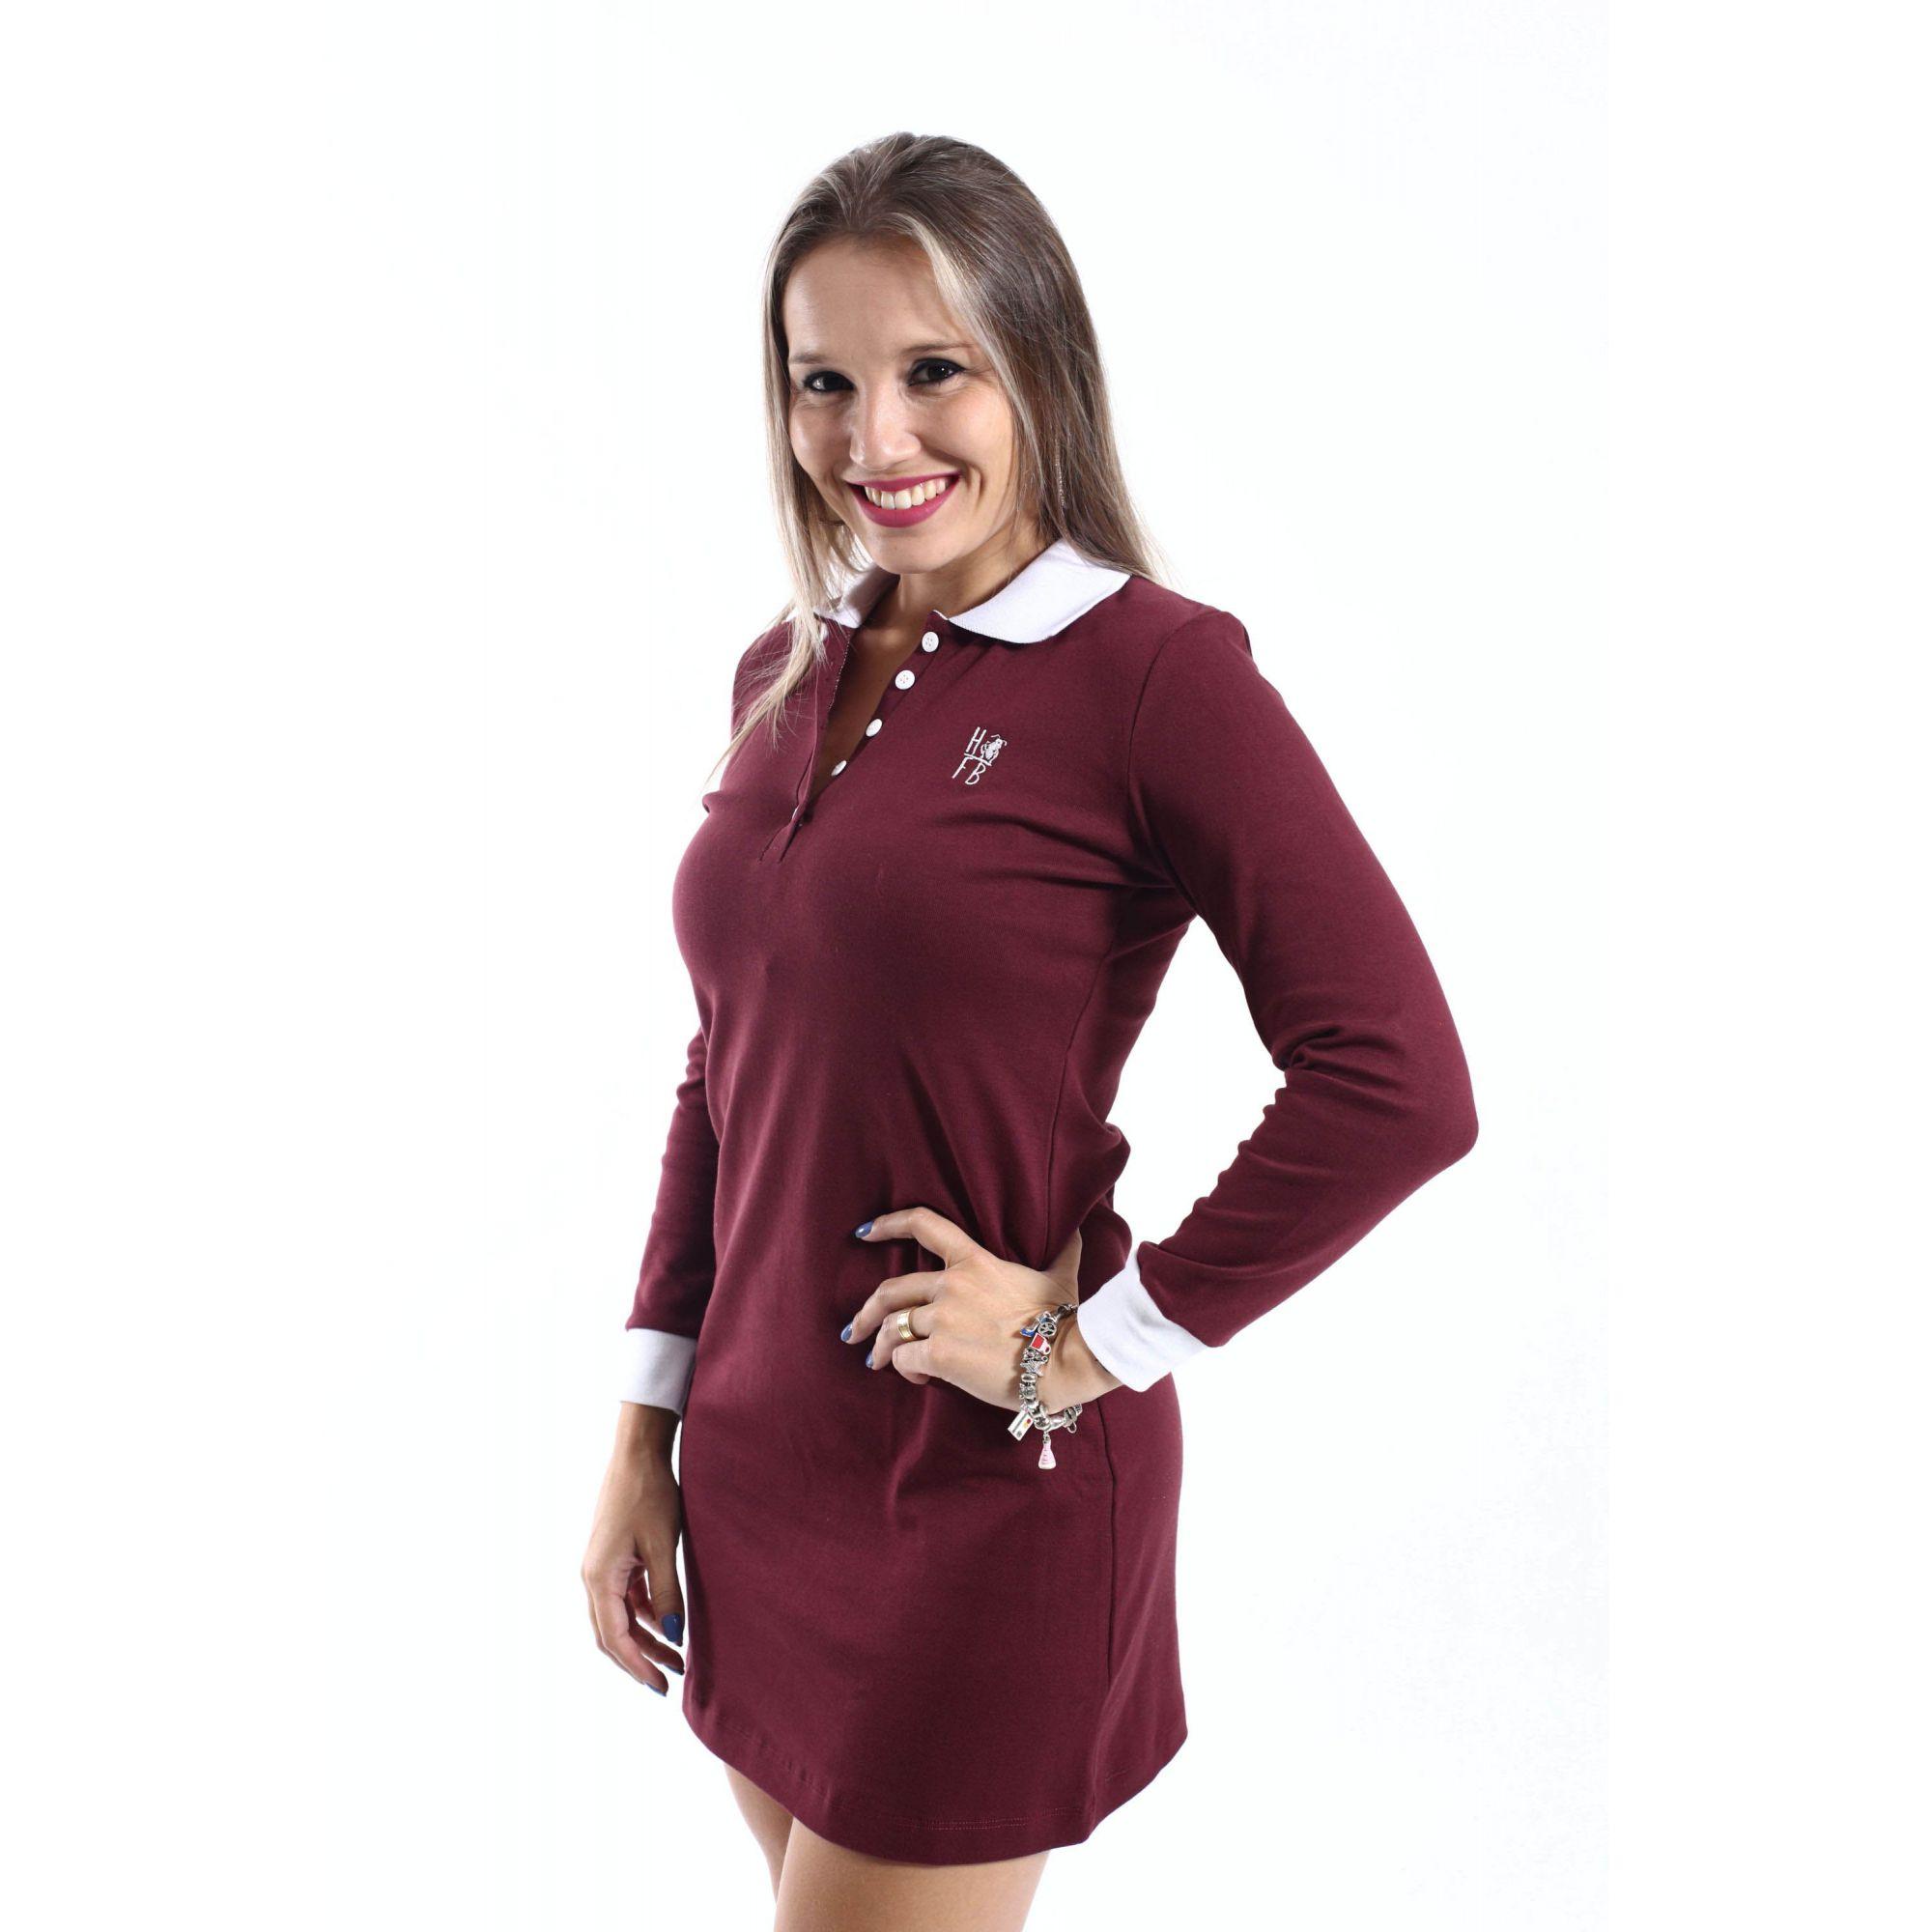 Vestido Manga Longa Vinho  - Heitor Fashion Brazil